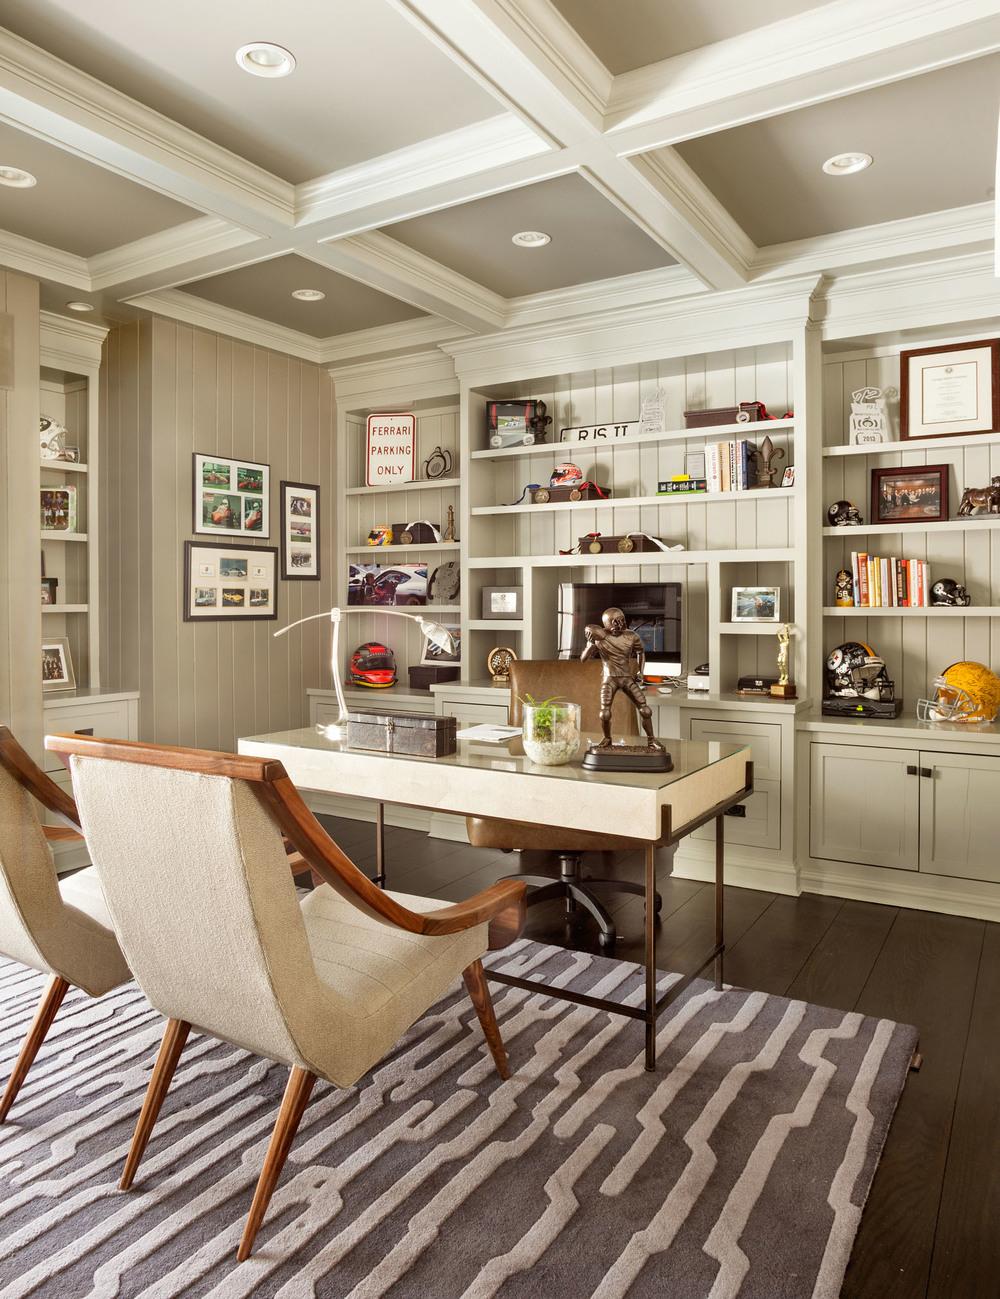 Desktop Interior Design Home Office Inspiration For Photos Full Hd Pics Inspiration